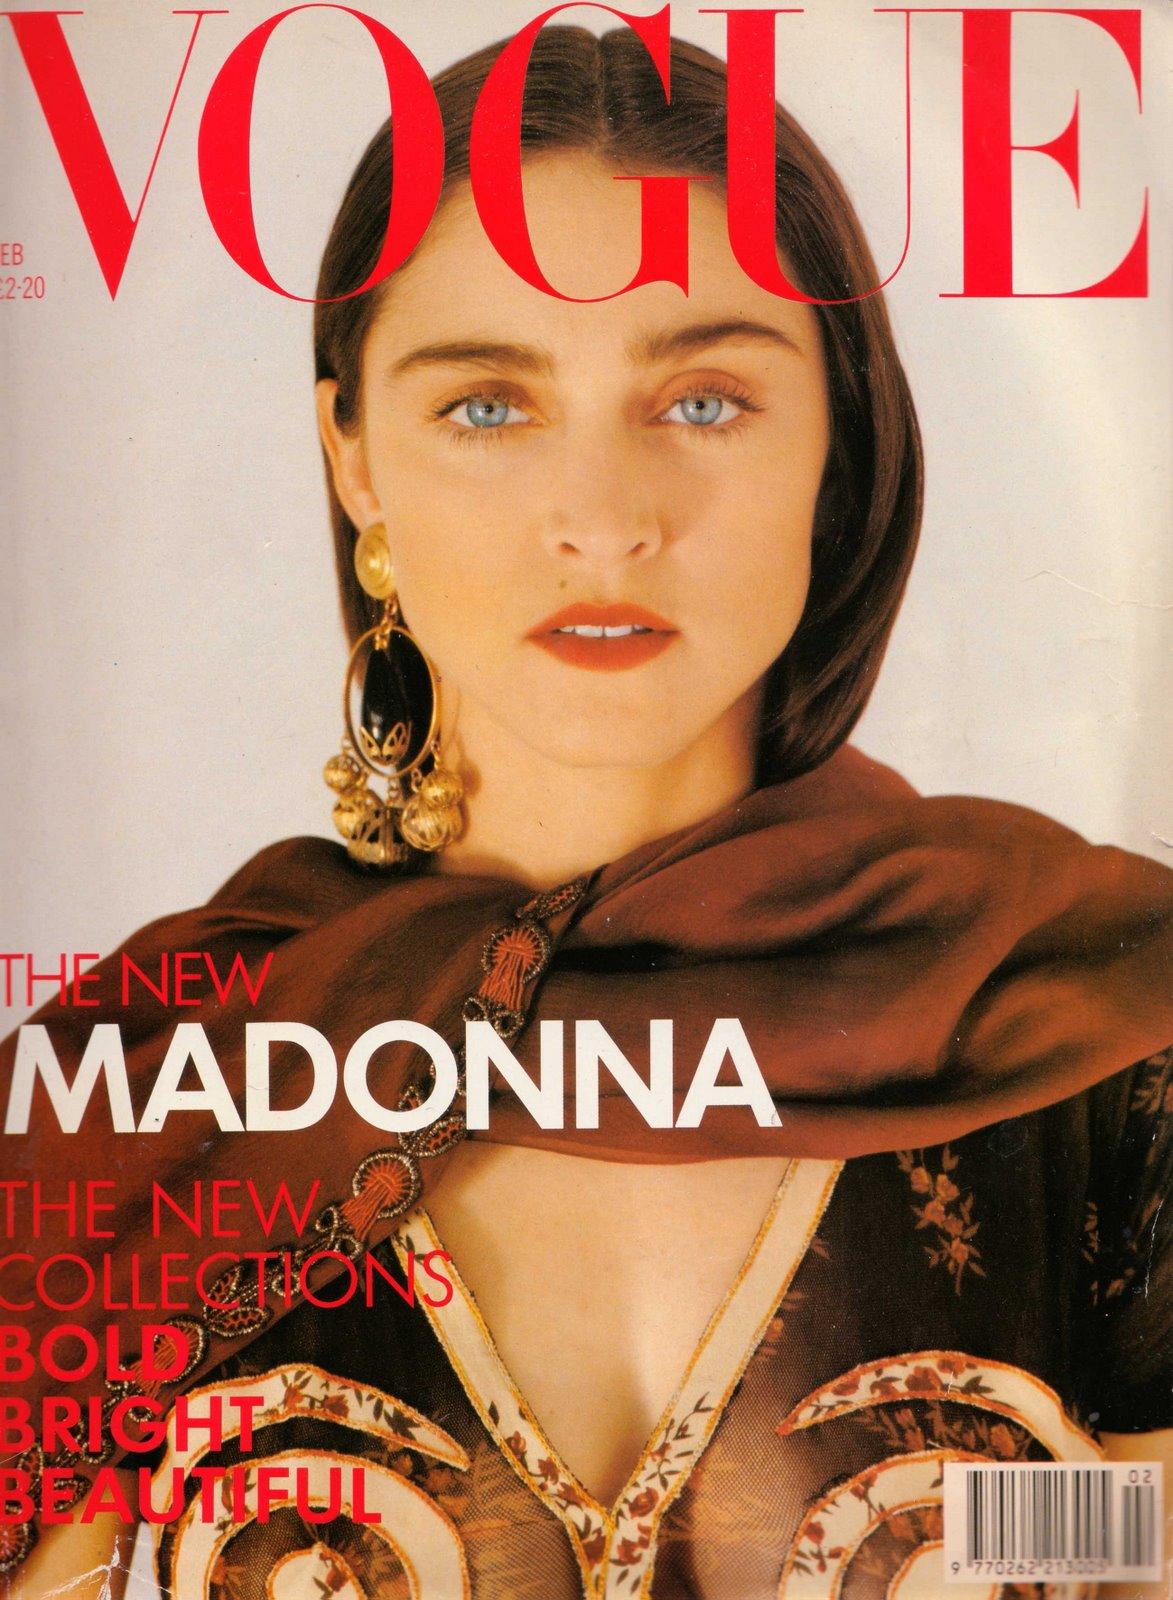 http://1.bp.blogspot.com/-5NtFm31ZC5E/TlJ_6ZQSgaI/AAAAAAAAA7I/IFq9gCsEMv4/s1600/british+vogue+madonna+1989+pud+cover.jpg